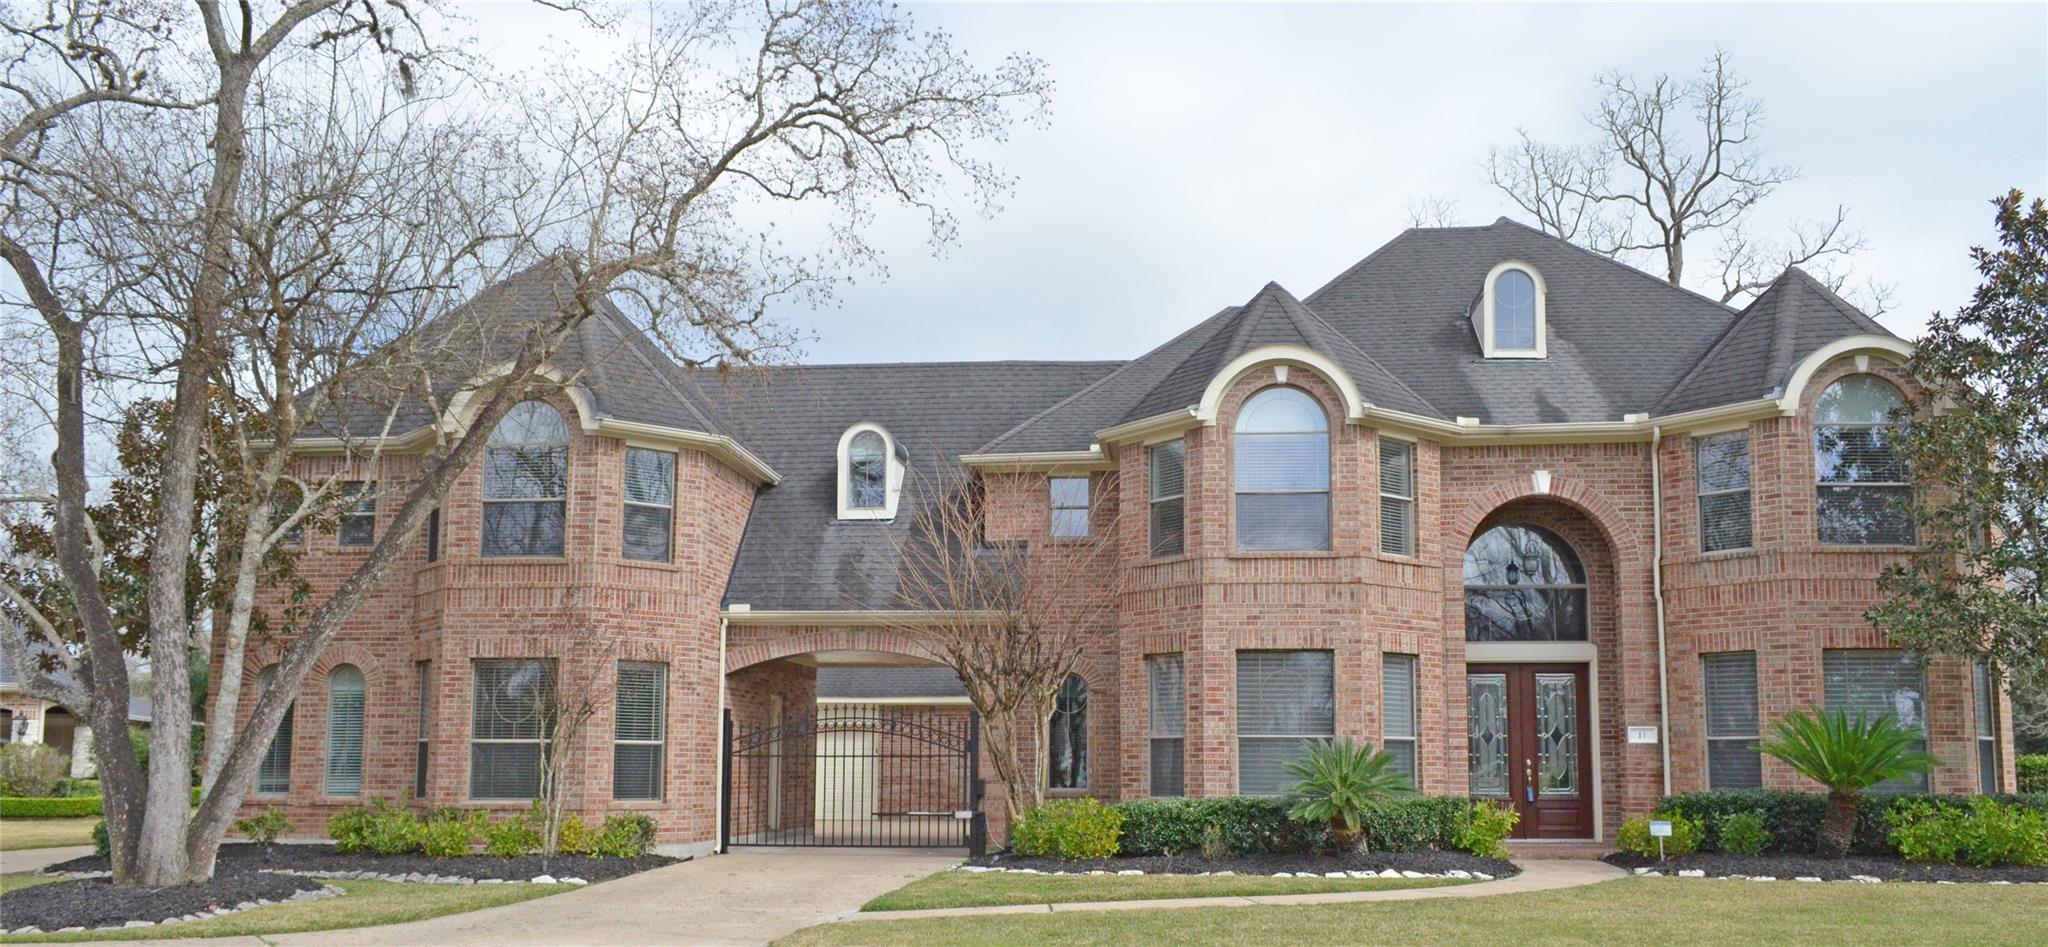 11 Bees Creek Knoll Property Photo - Missouri City, TX real estate listing